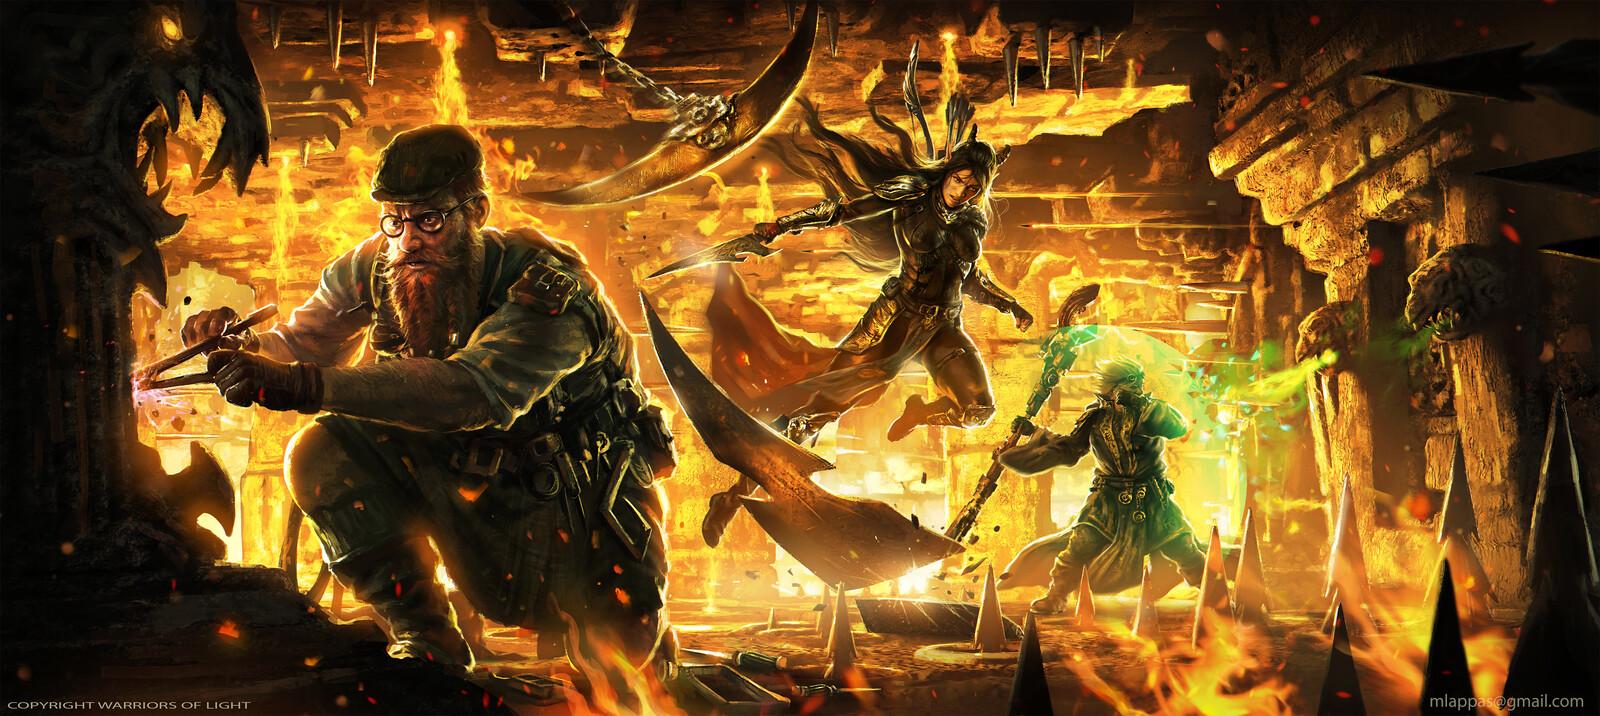 Heroes Vs Traps-Warriors of Light